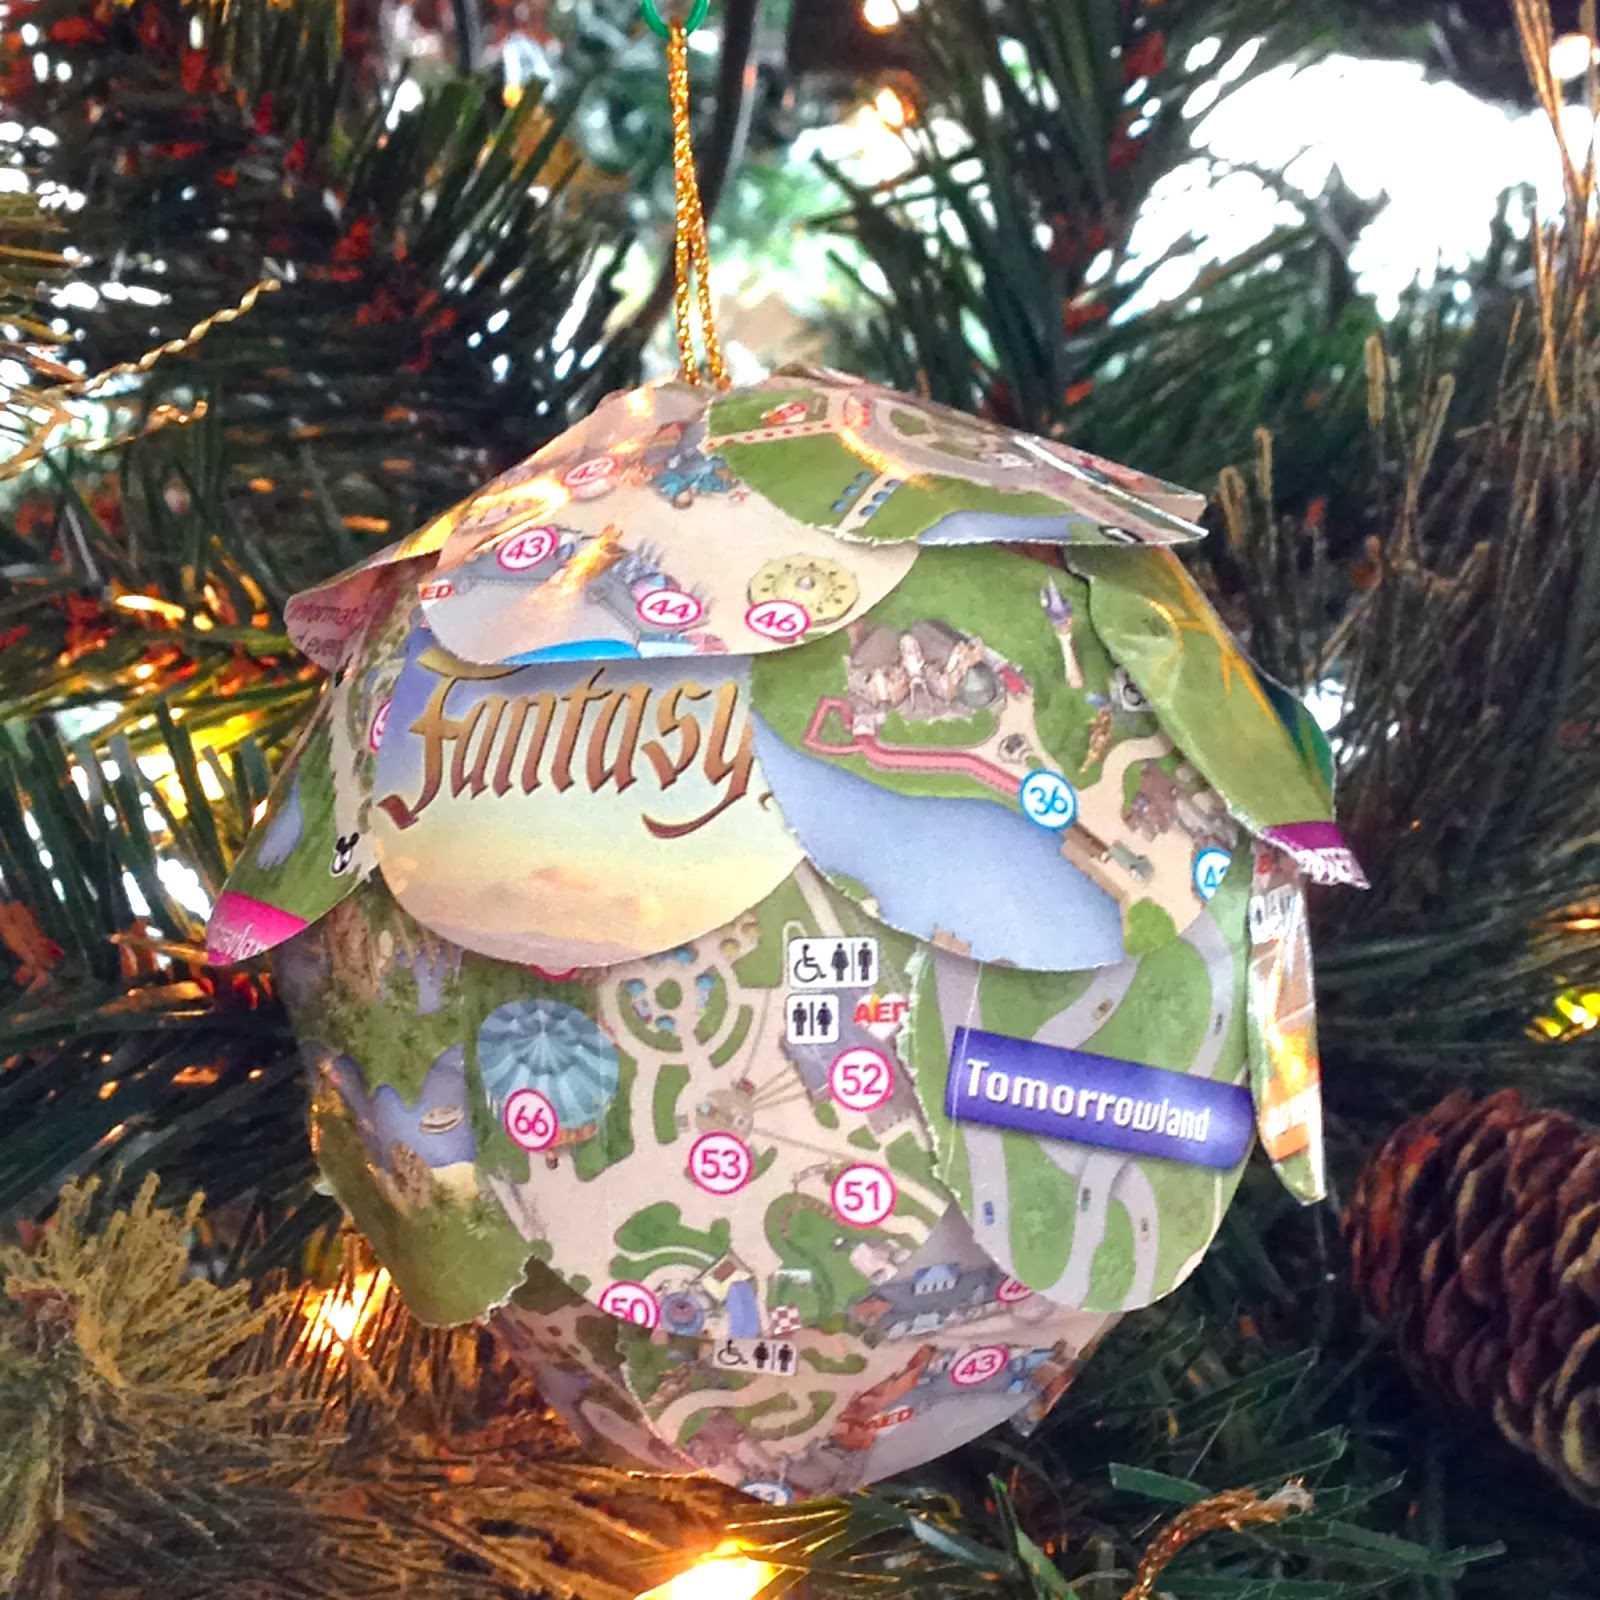 Disney 12 Days Of Christmas.Merryweather S Cottage Diy Disney 12 Days Of Christmas